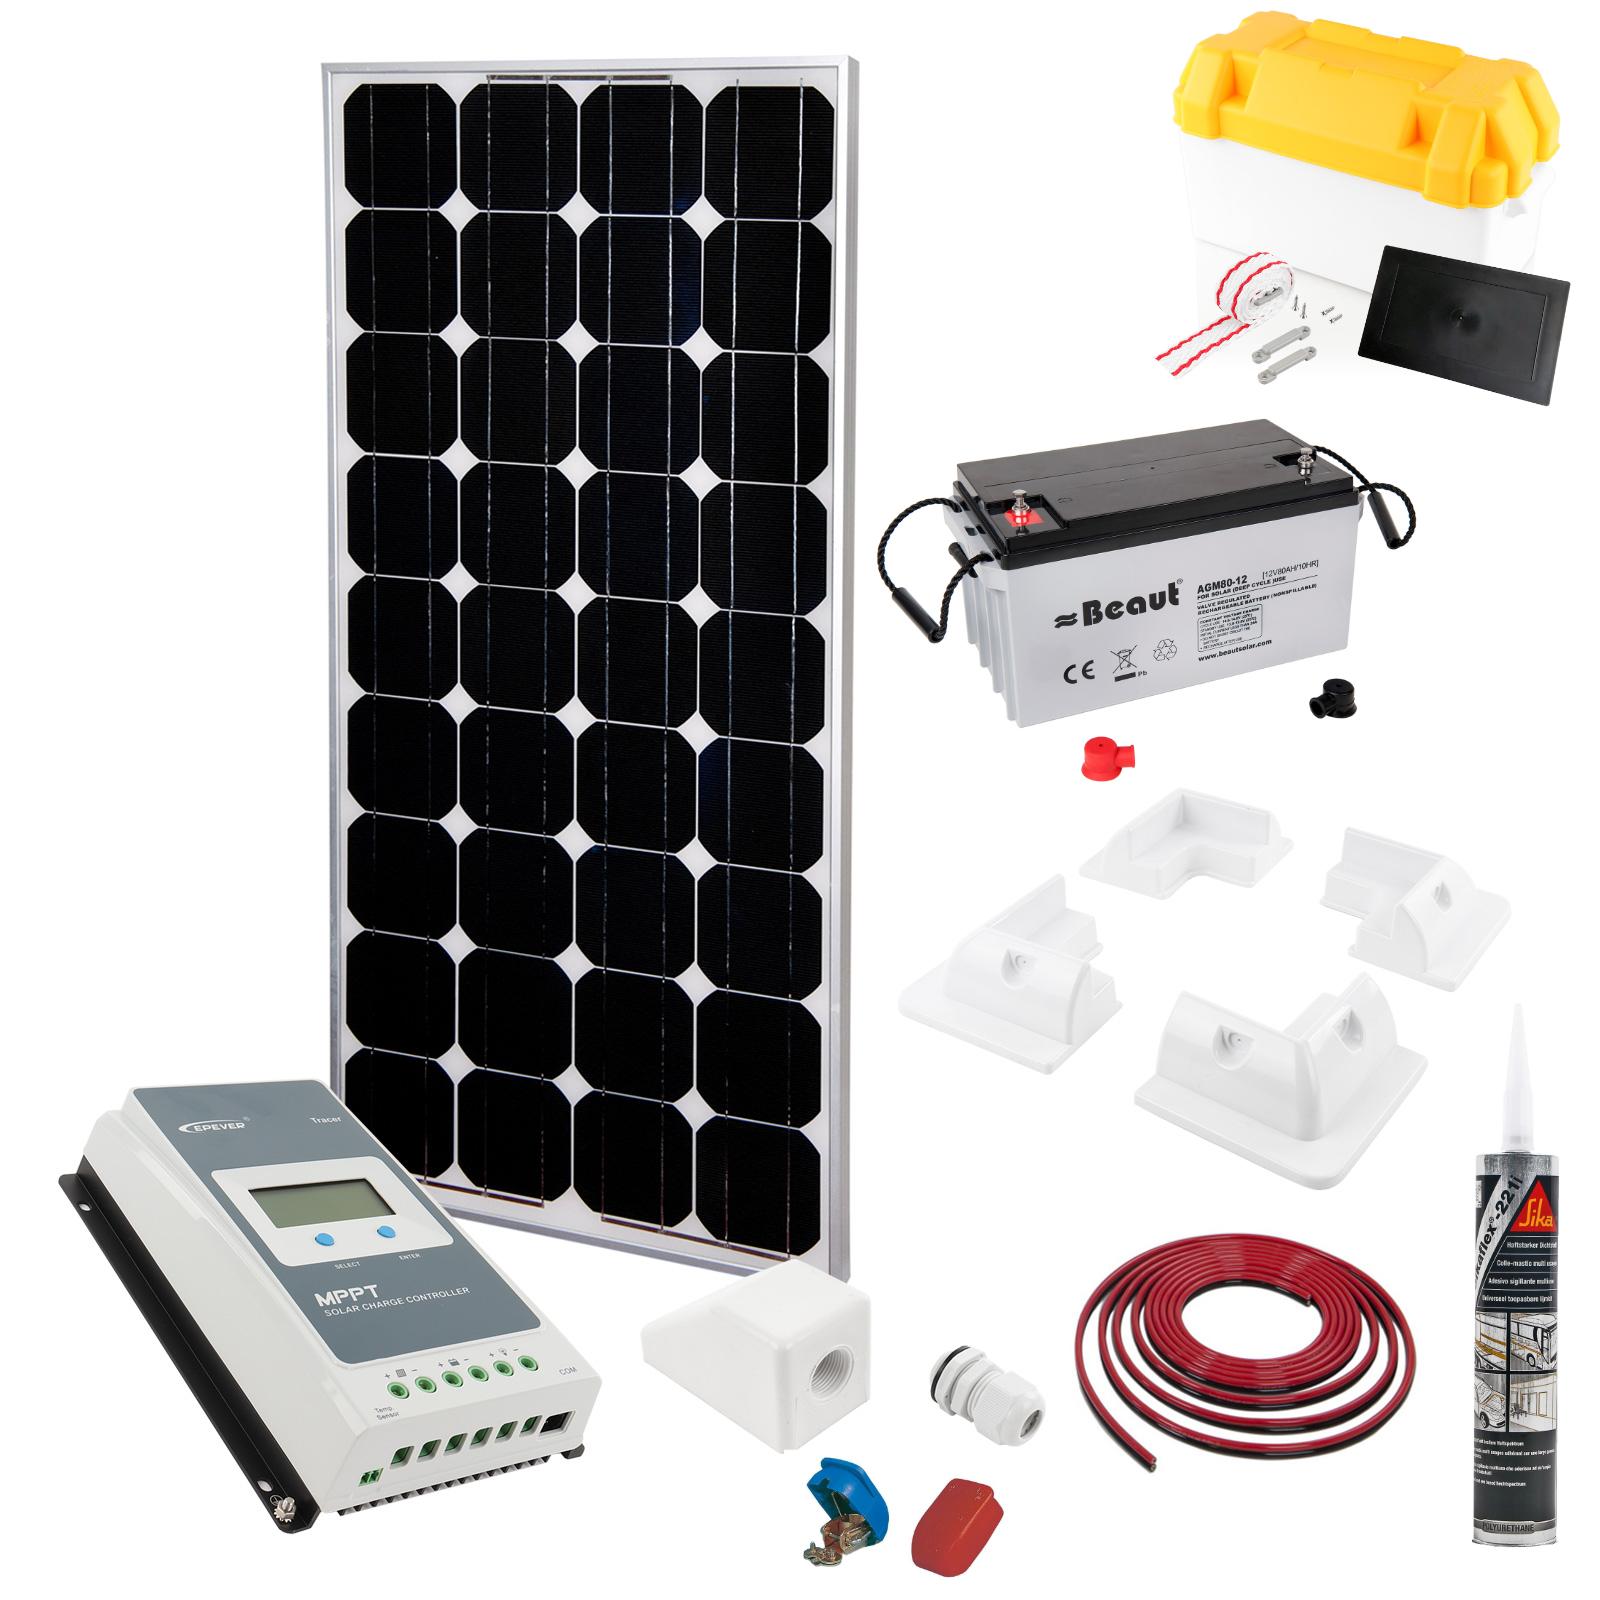 Solar Komplett Set 100W | MPPT Regler | AGM Batterie 100 Ah |Kabel | Sika |